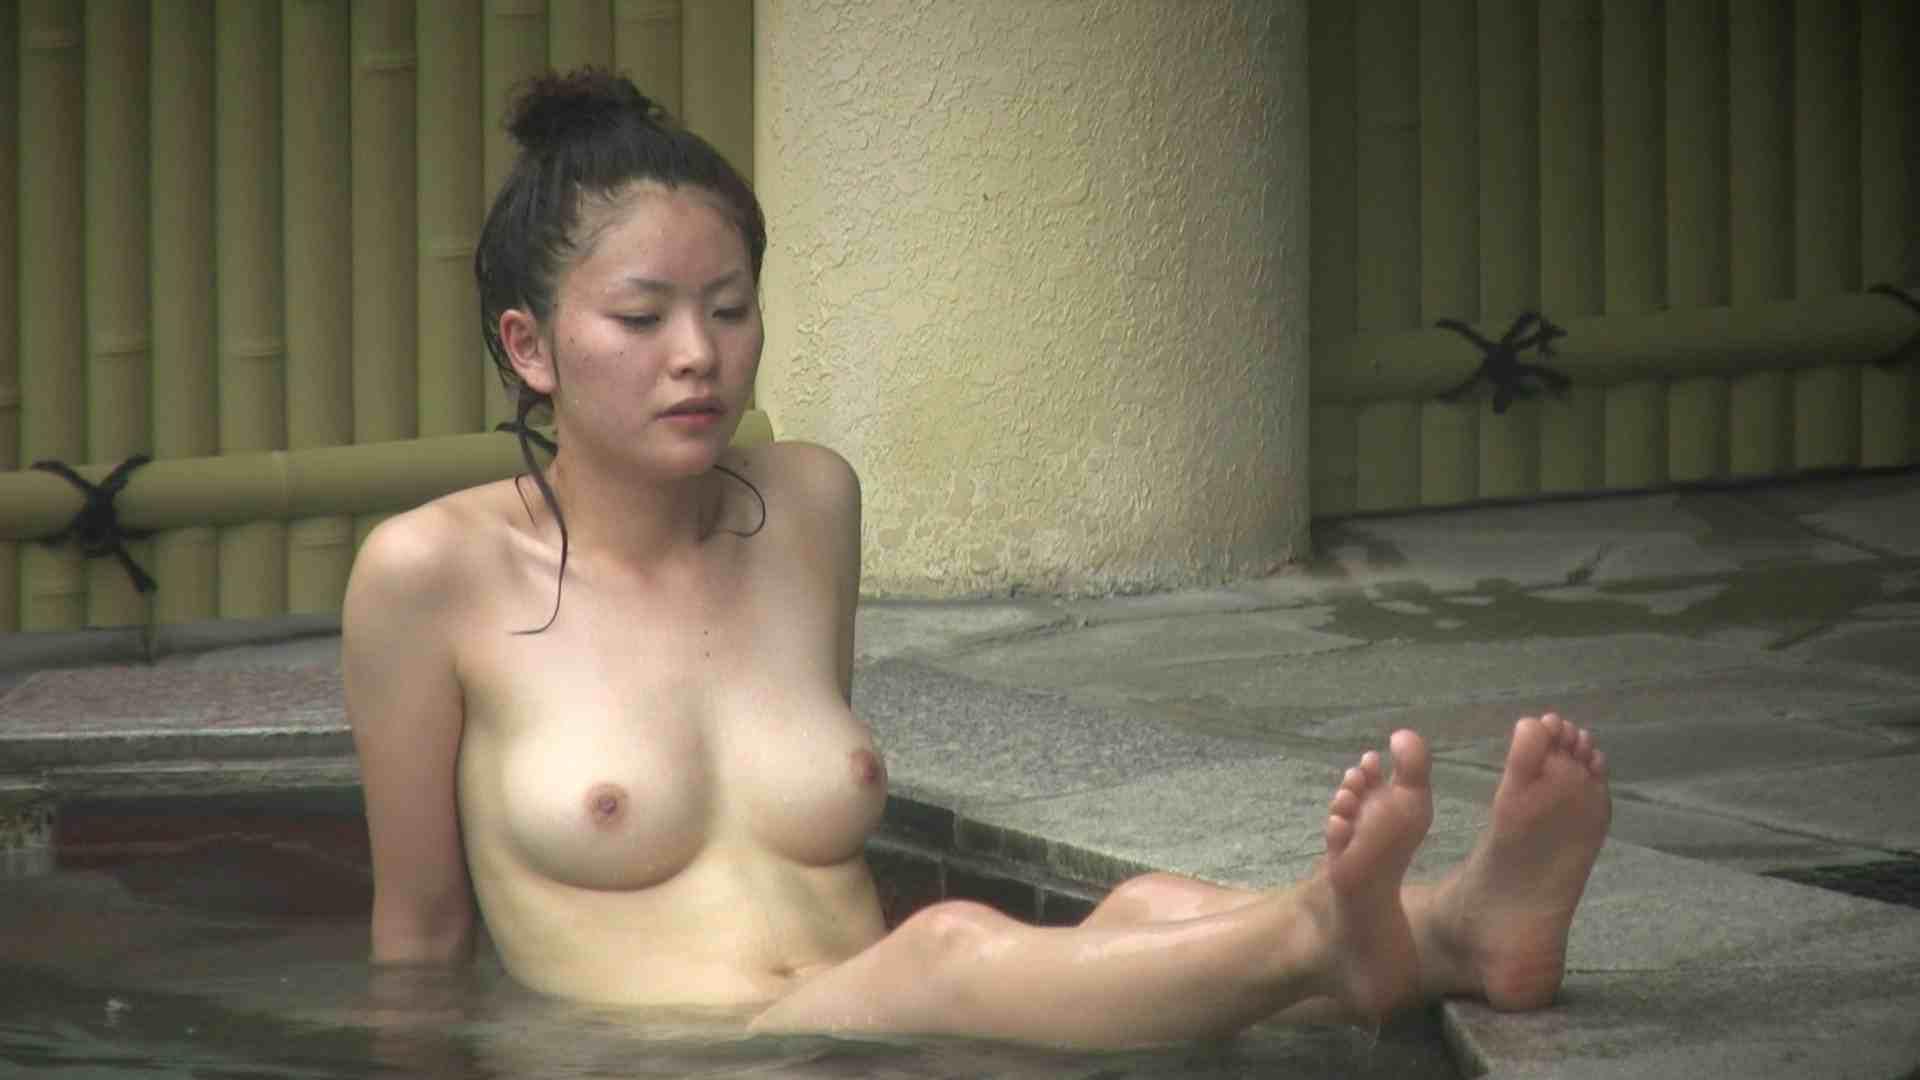 Aquaな露天風呂Vol.137 OLのエロ生活 | 露天風呂  76連発 70